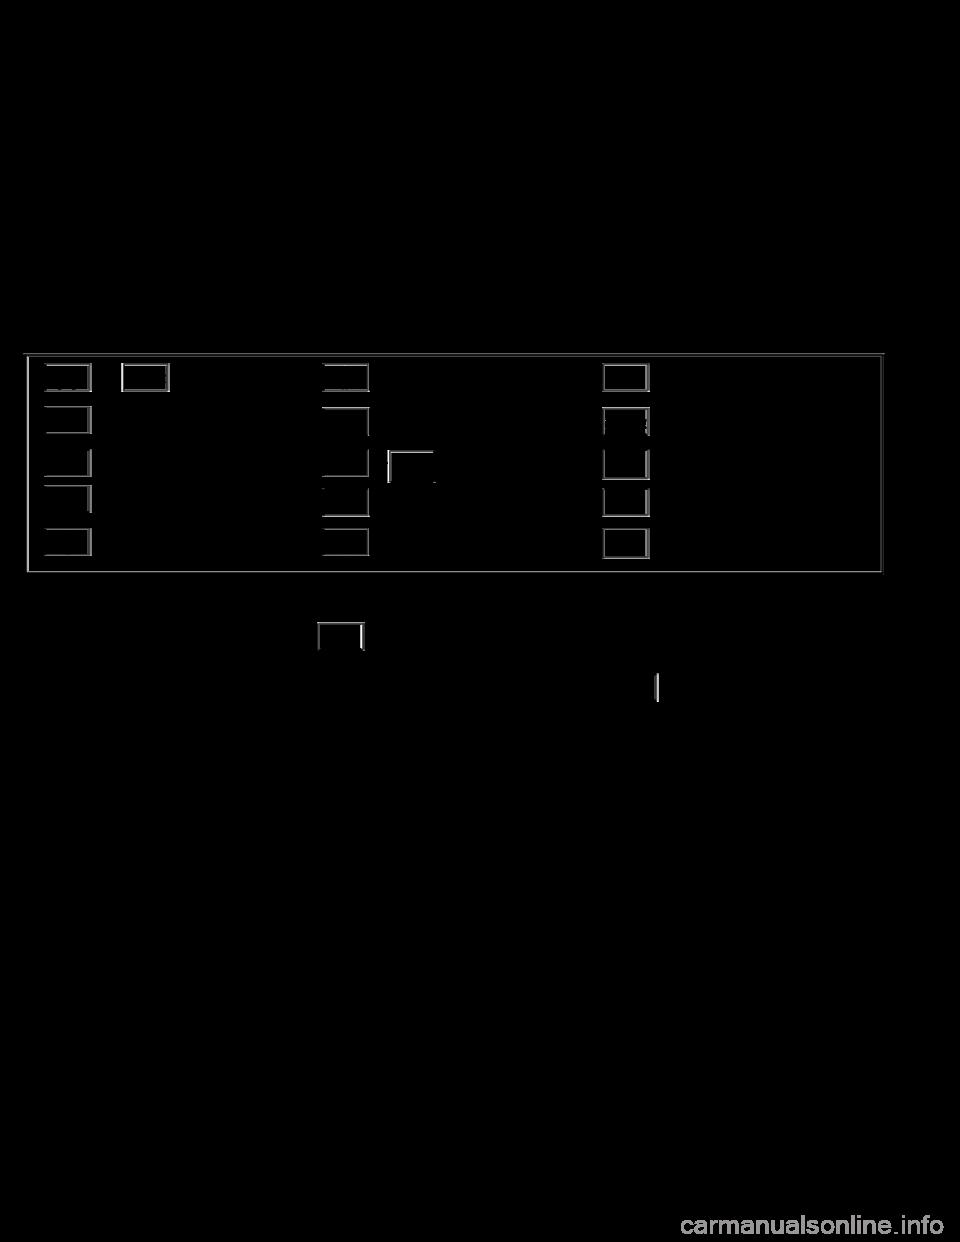 nissan altima brake fluid nissan altima 1996 u13 1 g owners manual  sc 1 st  Best Nissan car image wallpaper photo review sale specification & Nissan Altima Brake Fluid | Hydraulic Drift Handbrake Oil Tank For ... azcodes.com